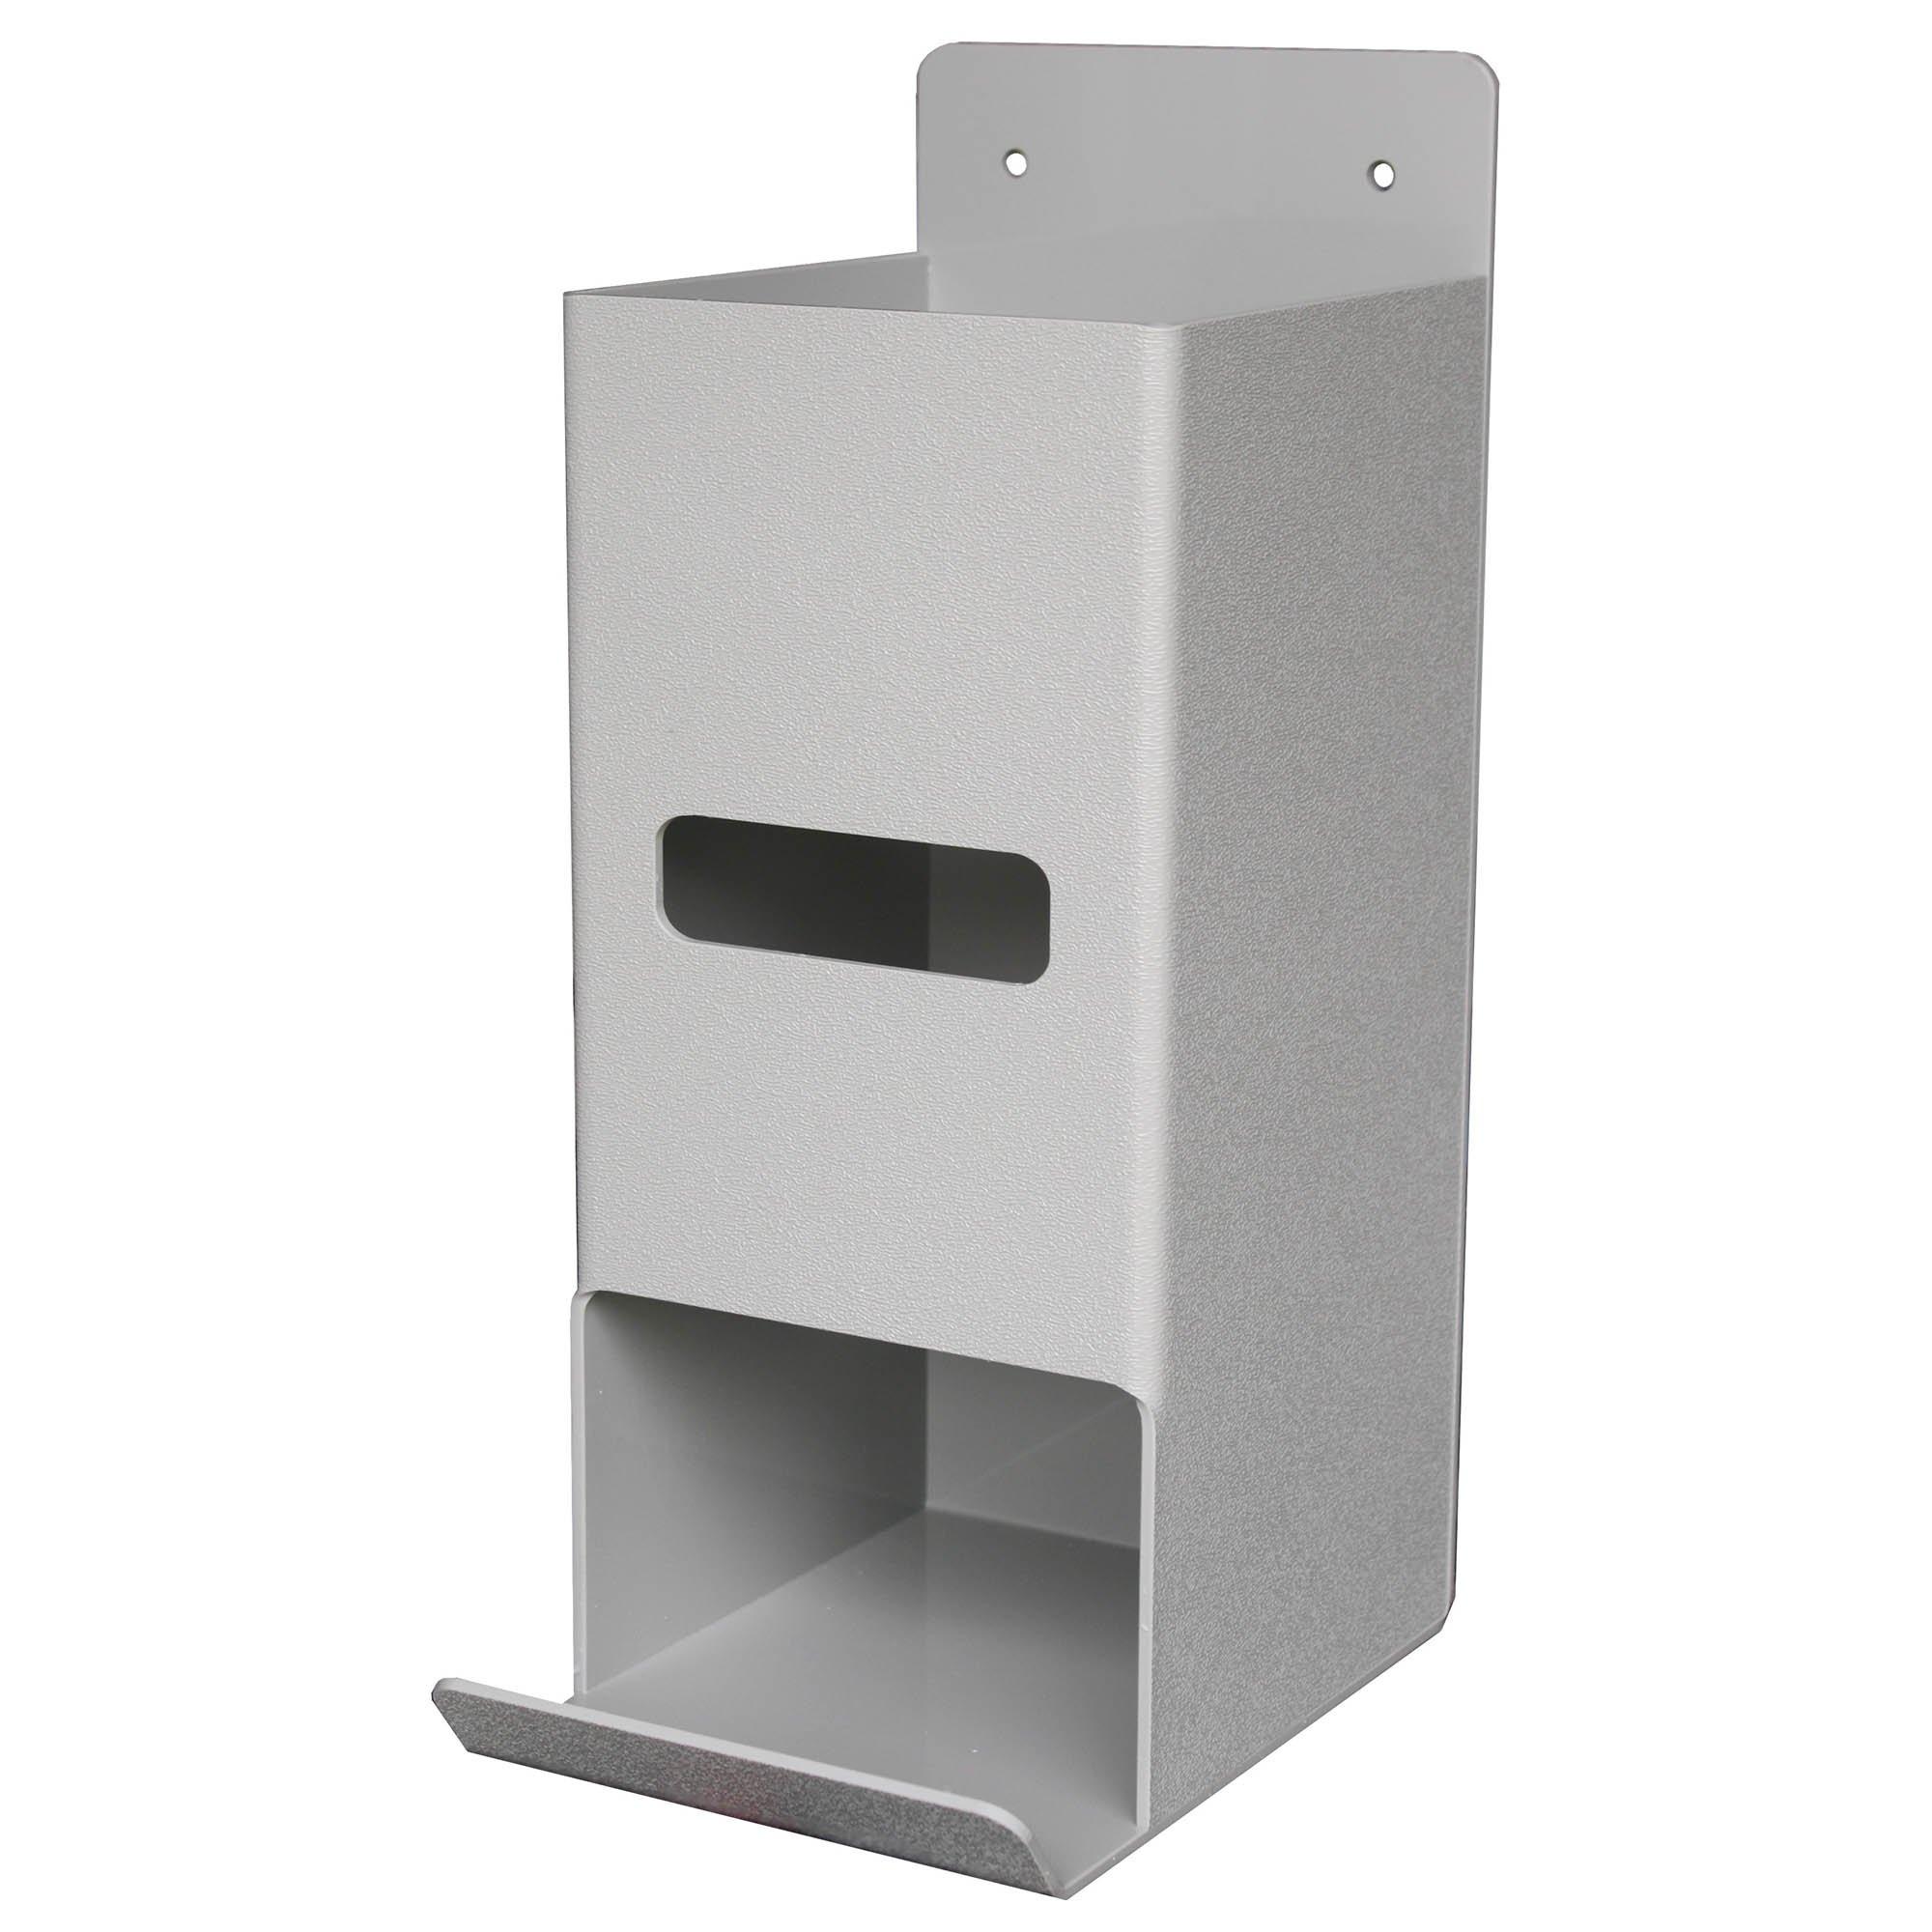 Surgical Scrub Brush Dispenser - Gray ABS